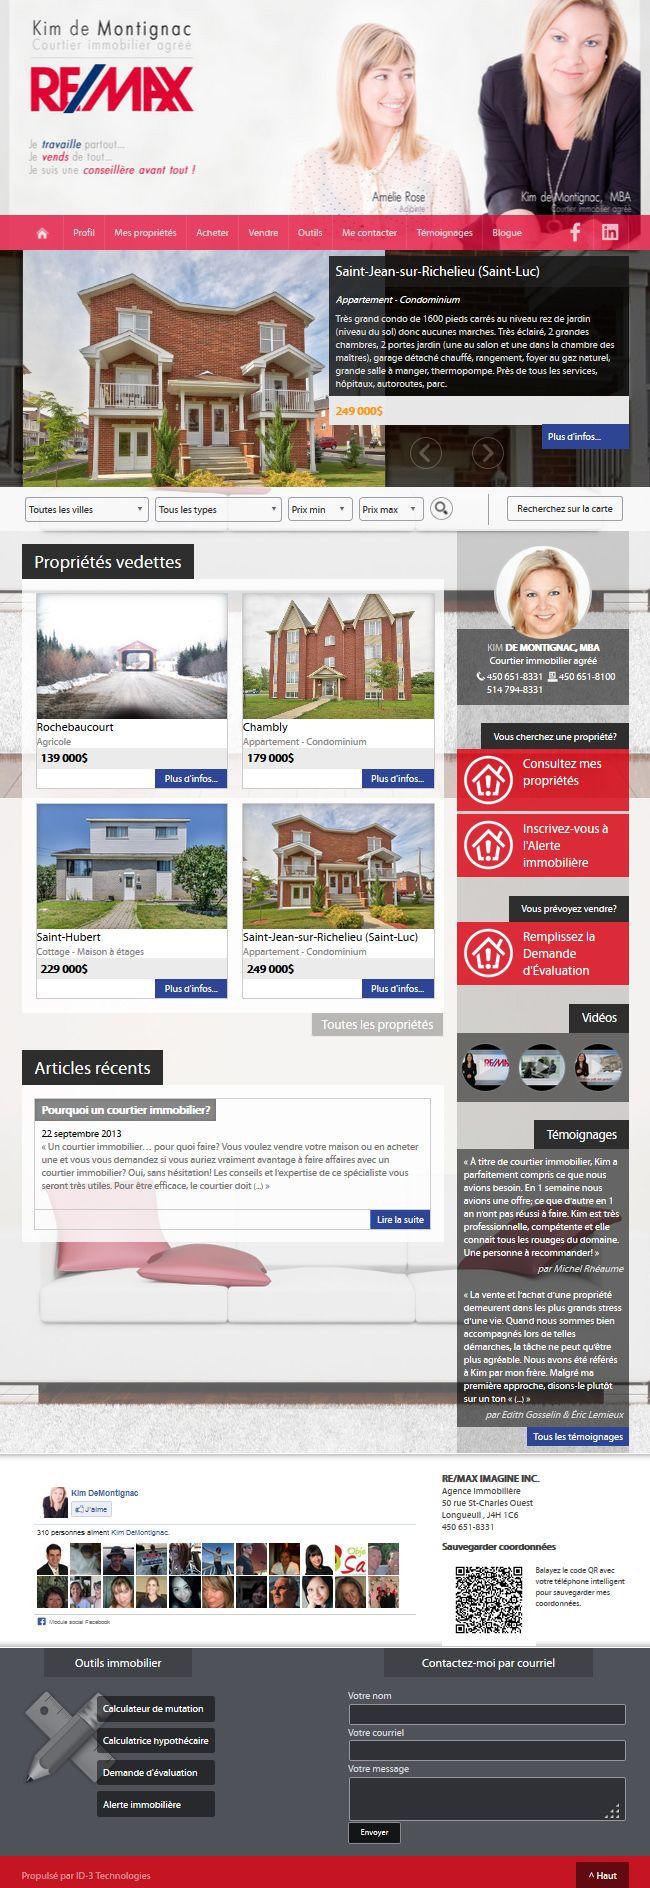 Kim De Montignac Courtier Immobilier Remax Aliquando Immobilier Vendre Acheter Maison Http Kimdemontignac Com